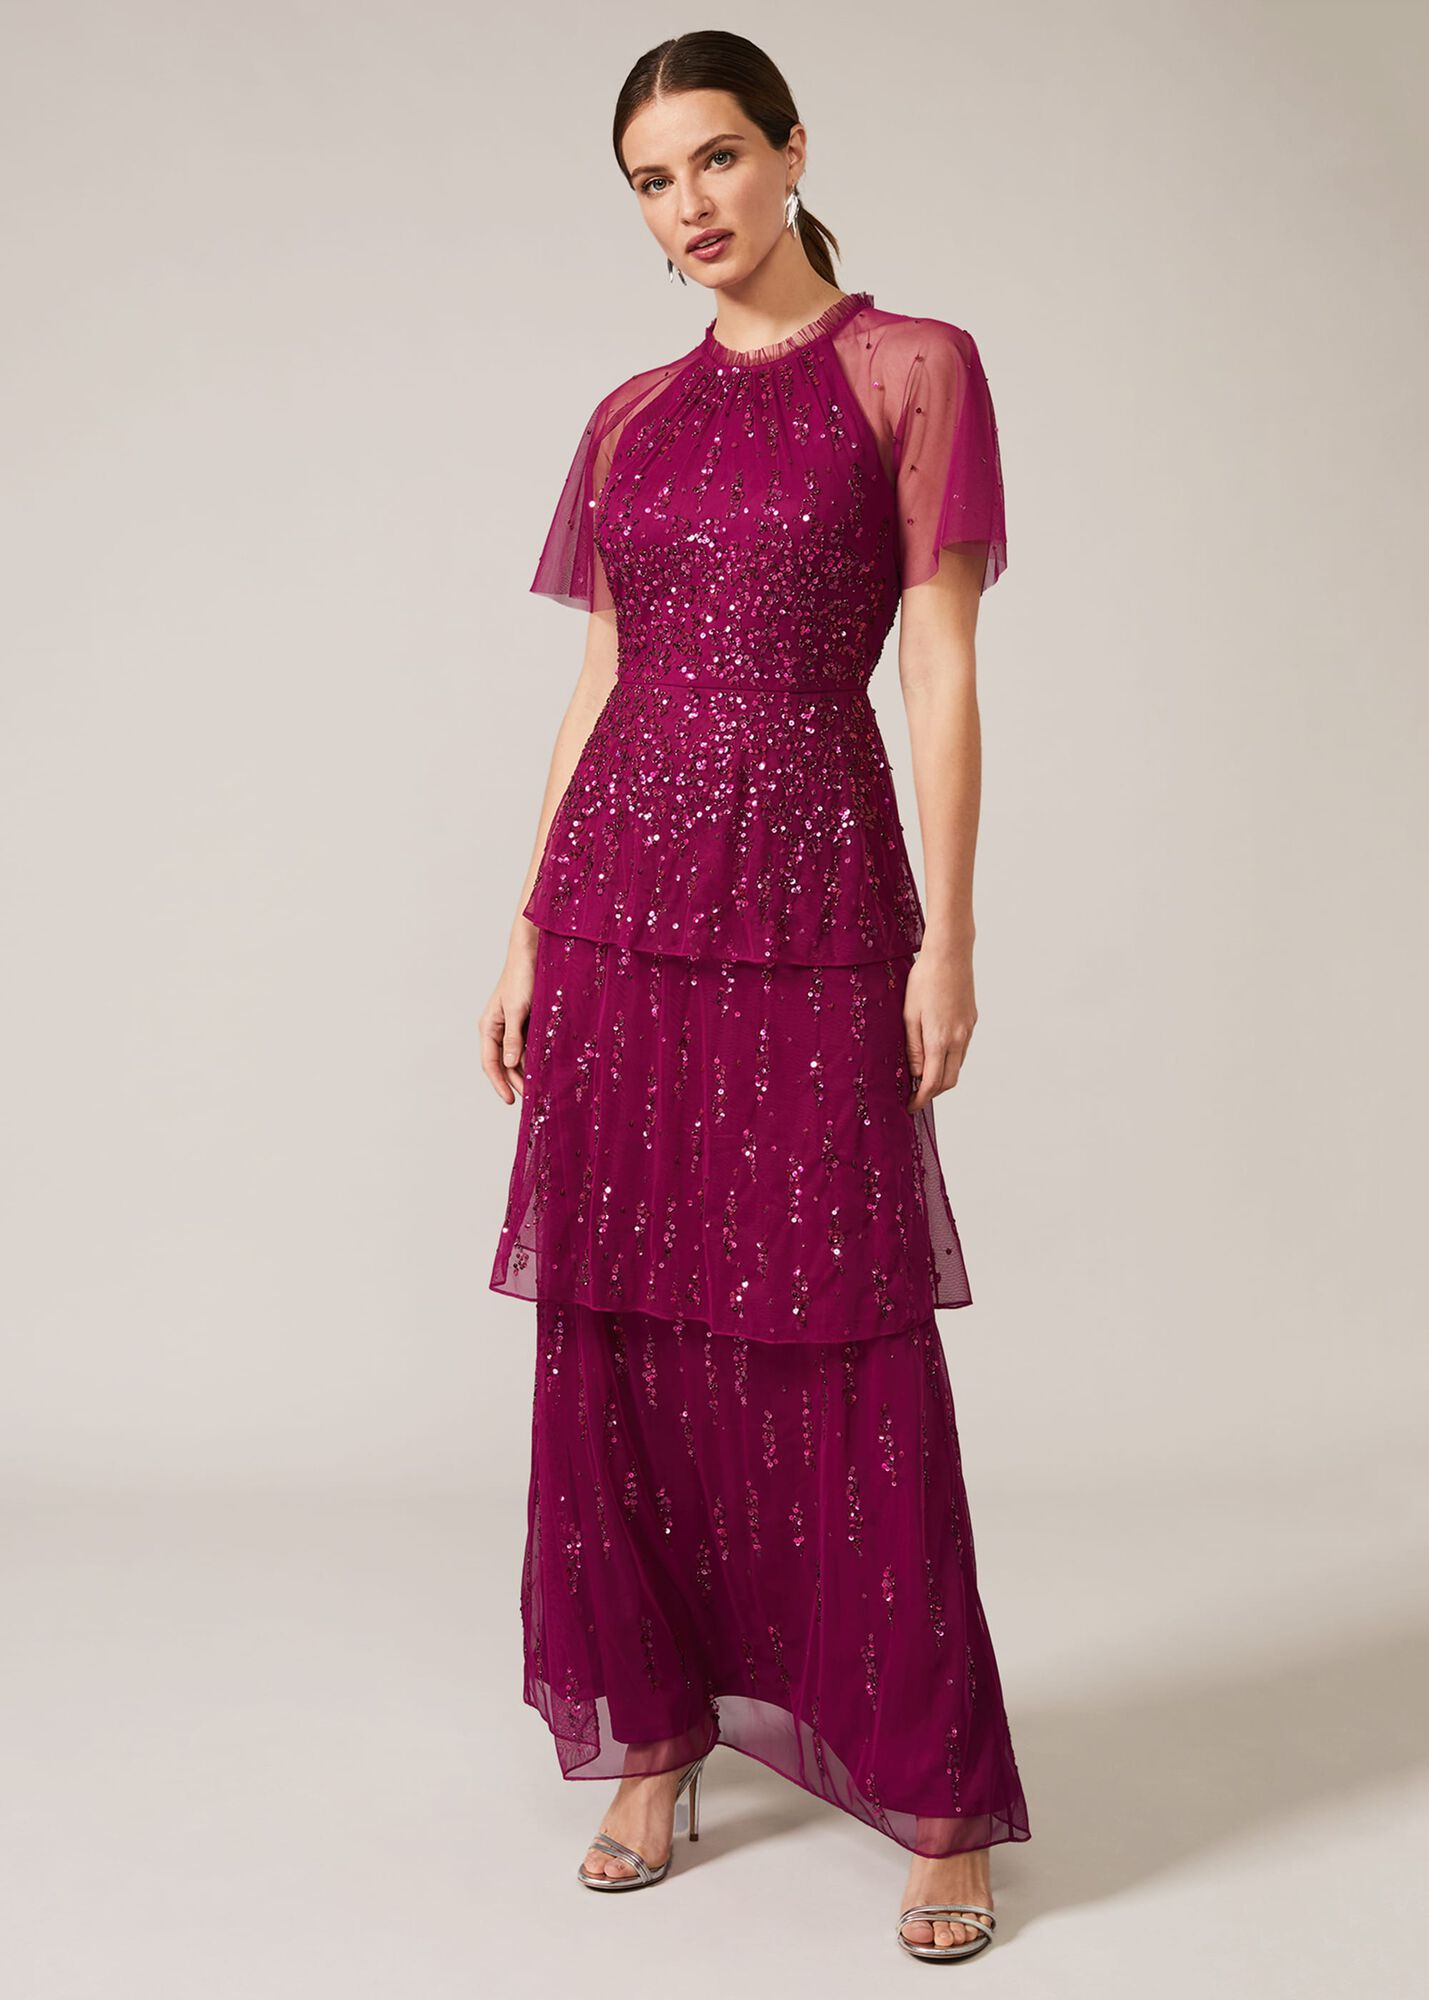 209427720-01-liliana-tiered-embellished-dress.jpg?sw=1429&sh=2000&strip=false